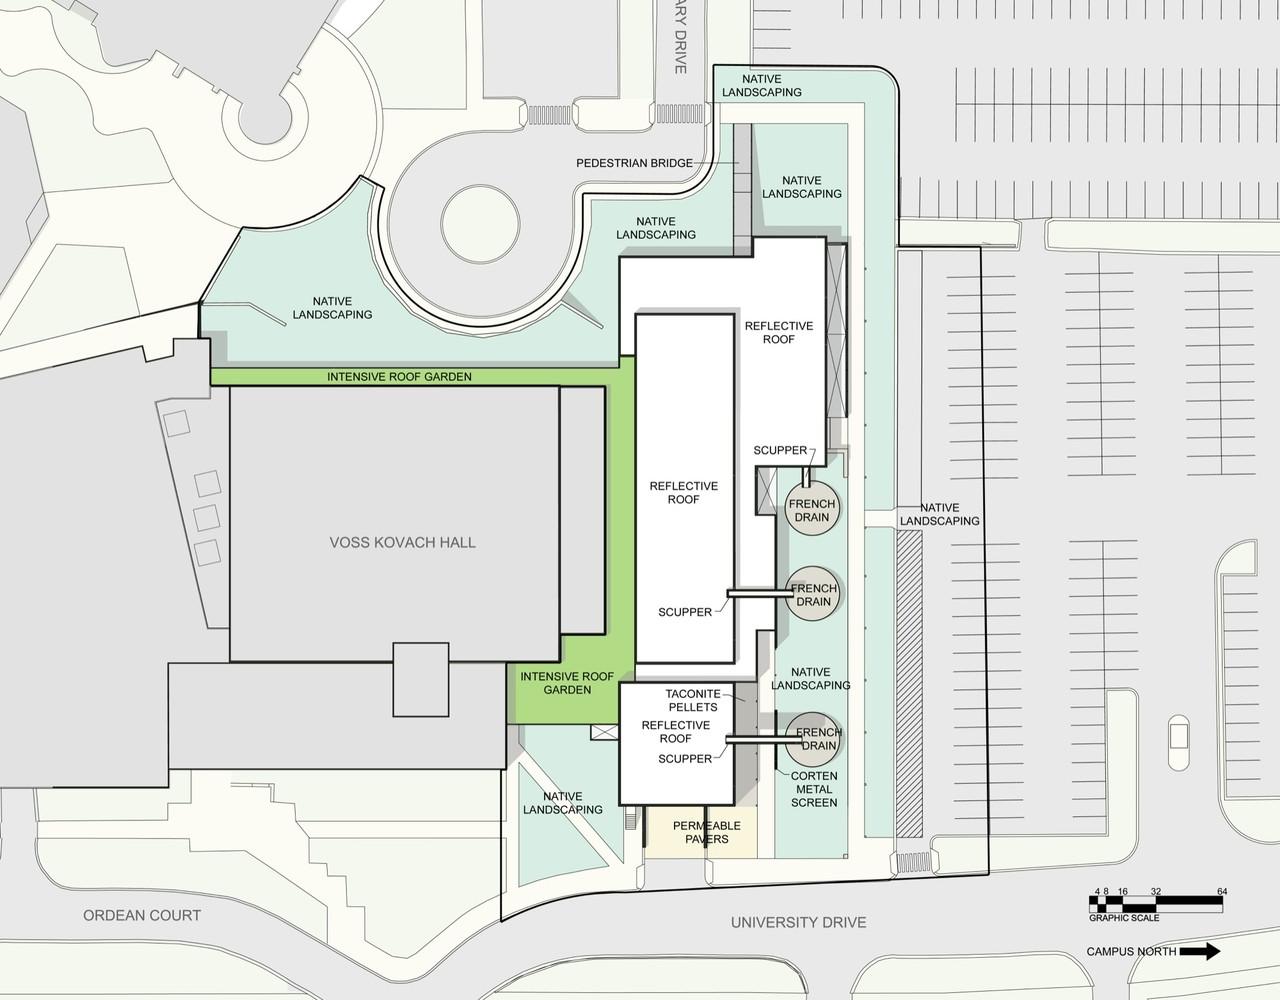 Gallery of UMD Swenson Civil Engineering Building / Ross-Barney